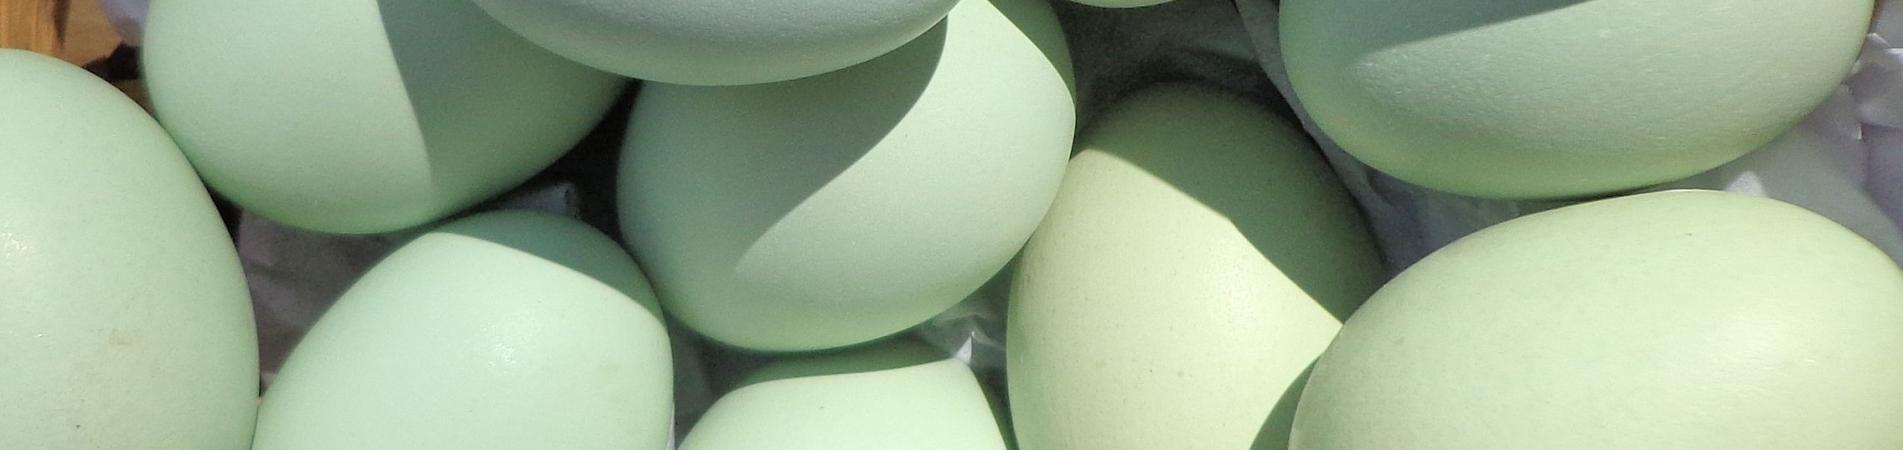 Proyecto FIA Huevos Azules